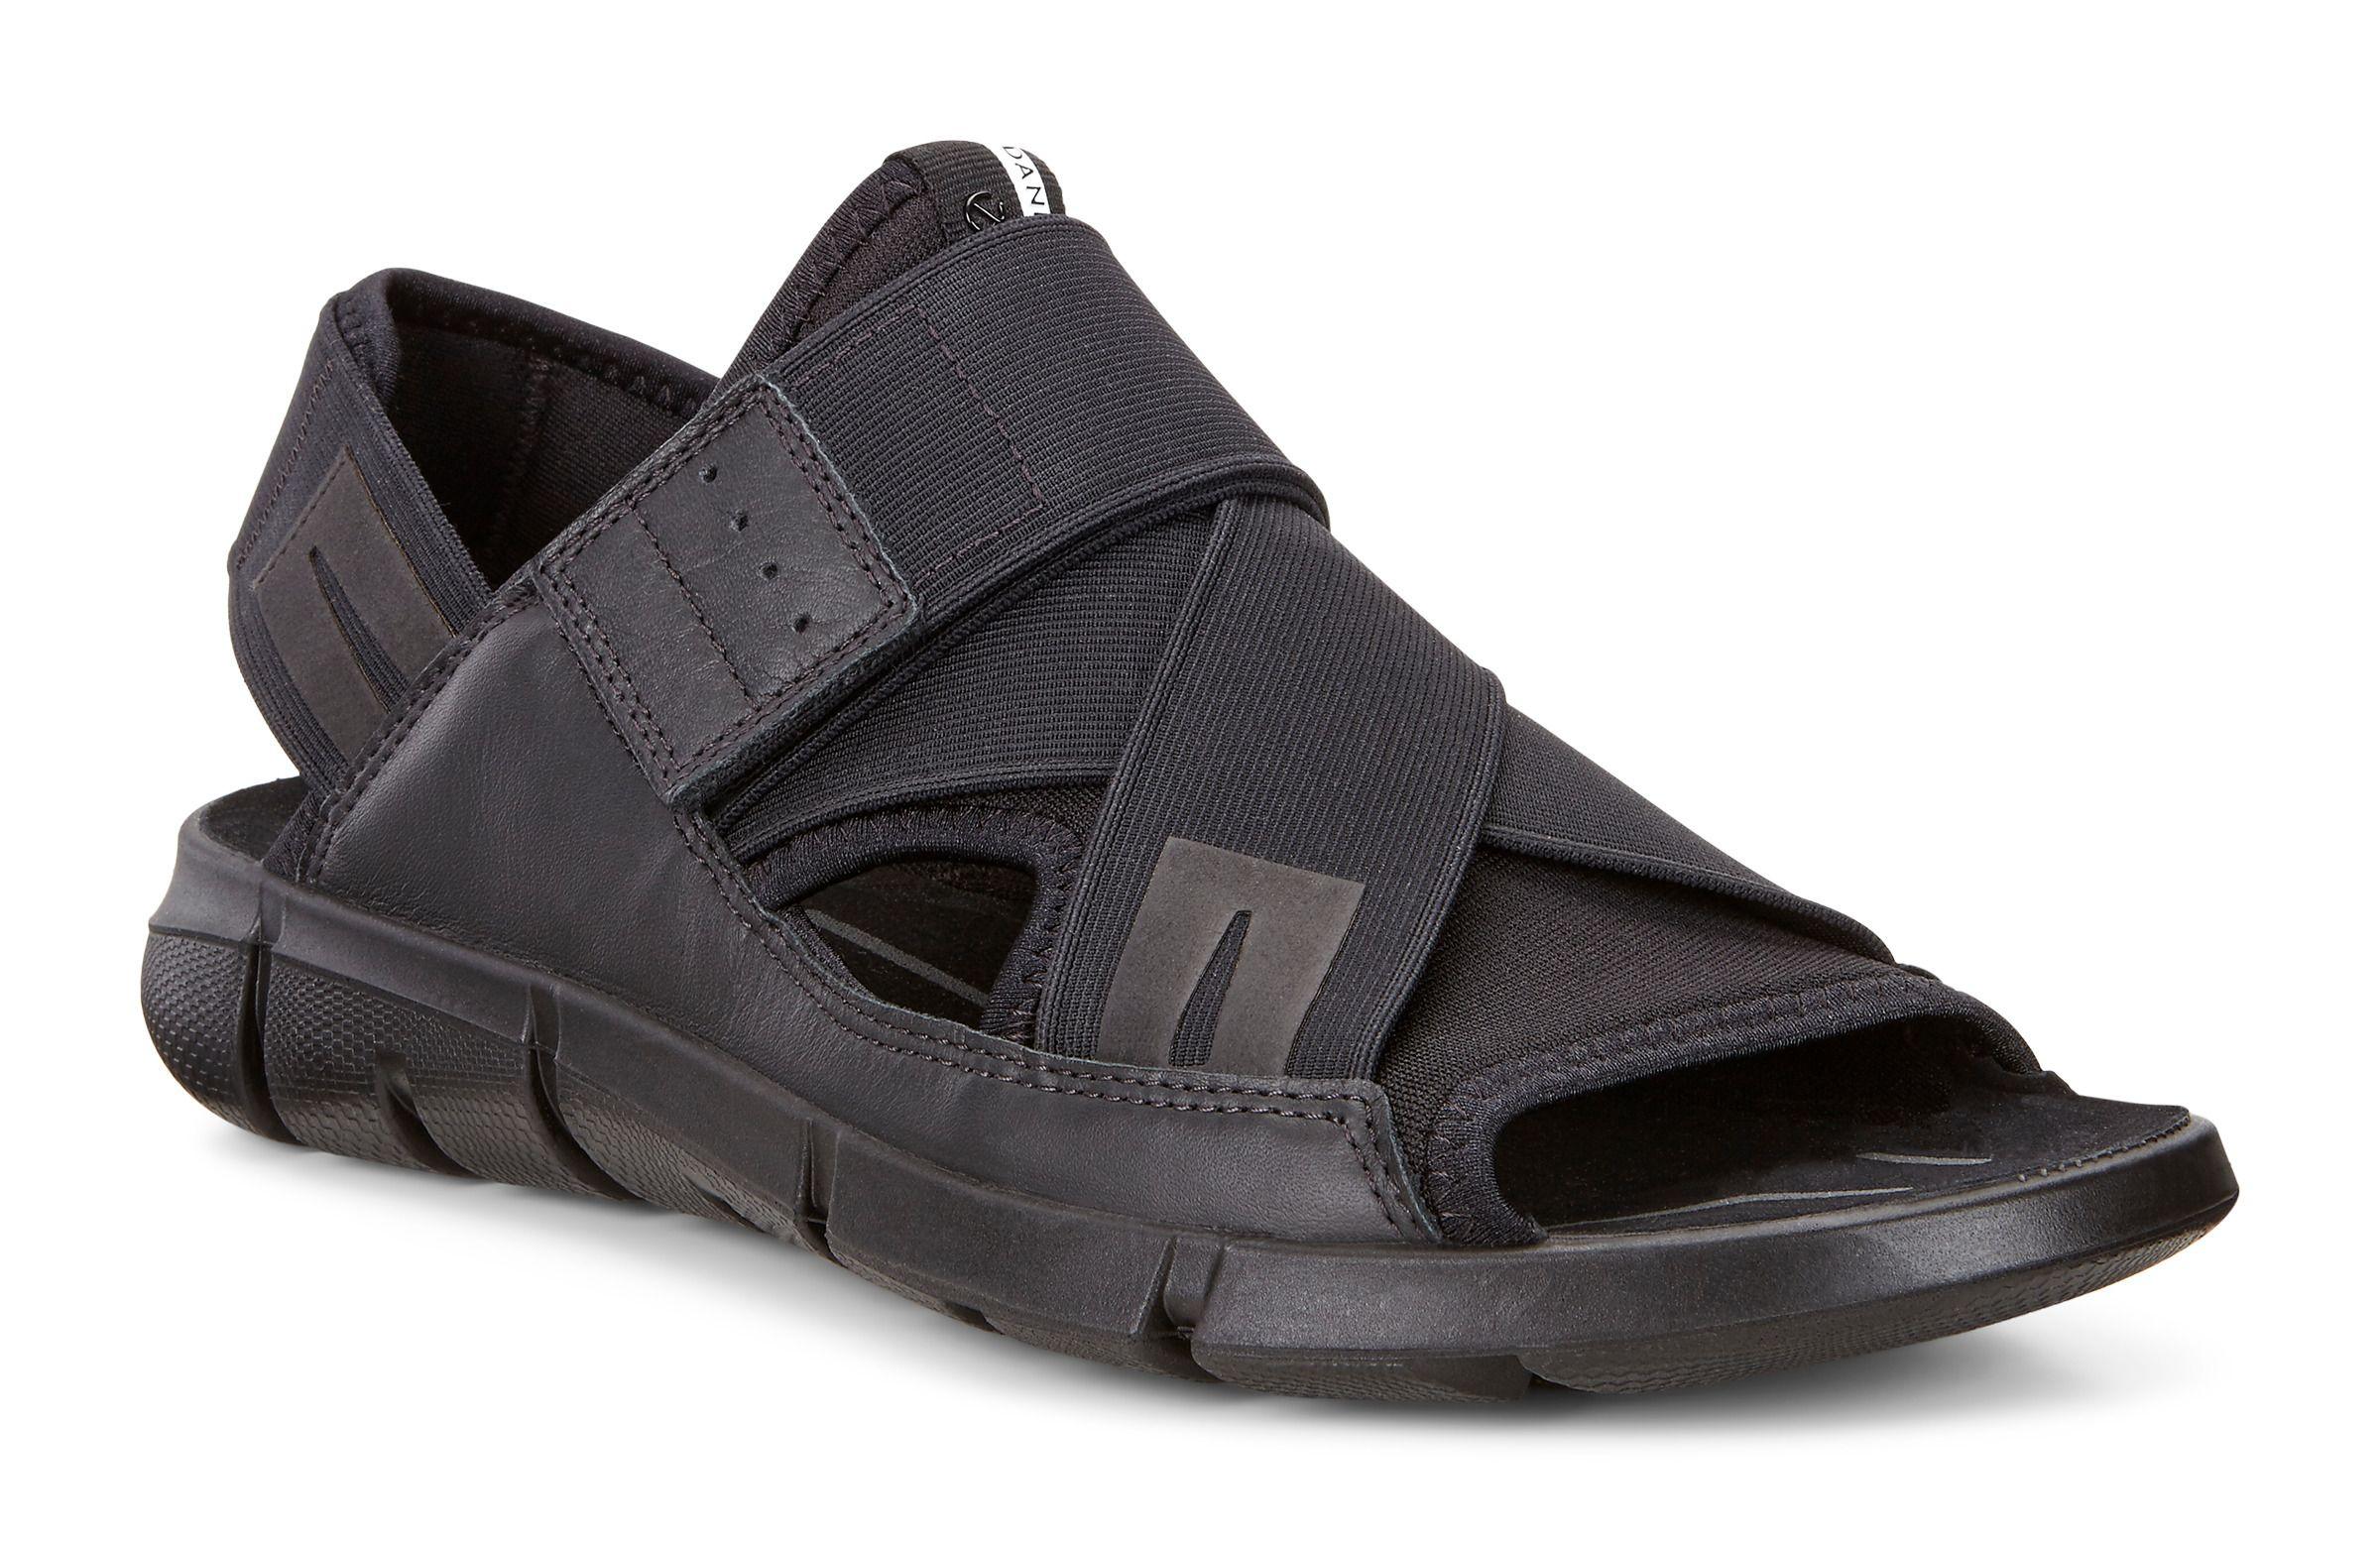 Ecco Intrinsic Sandal Sneakers Men Fashion Trending Womens Shoes Kids Sandals